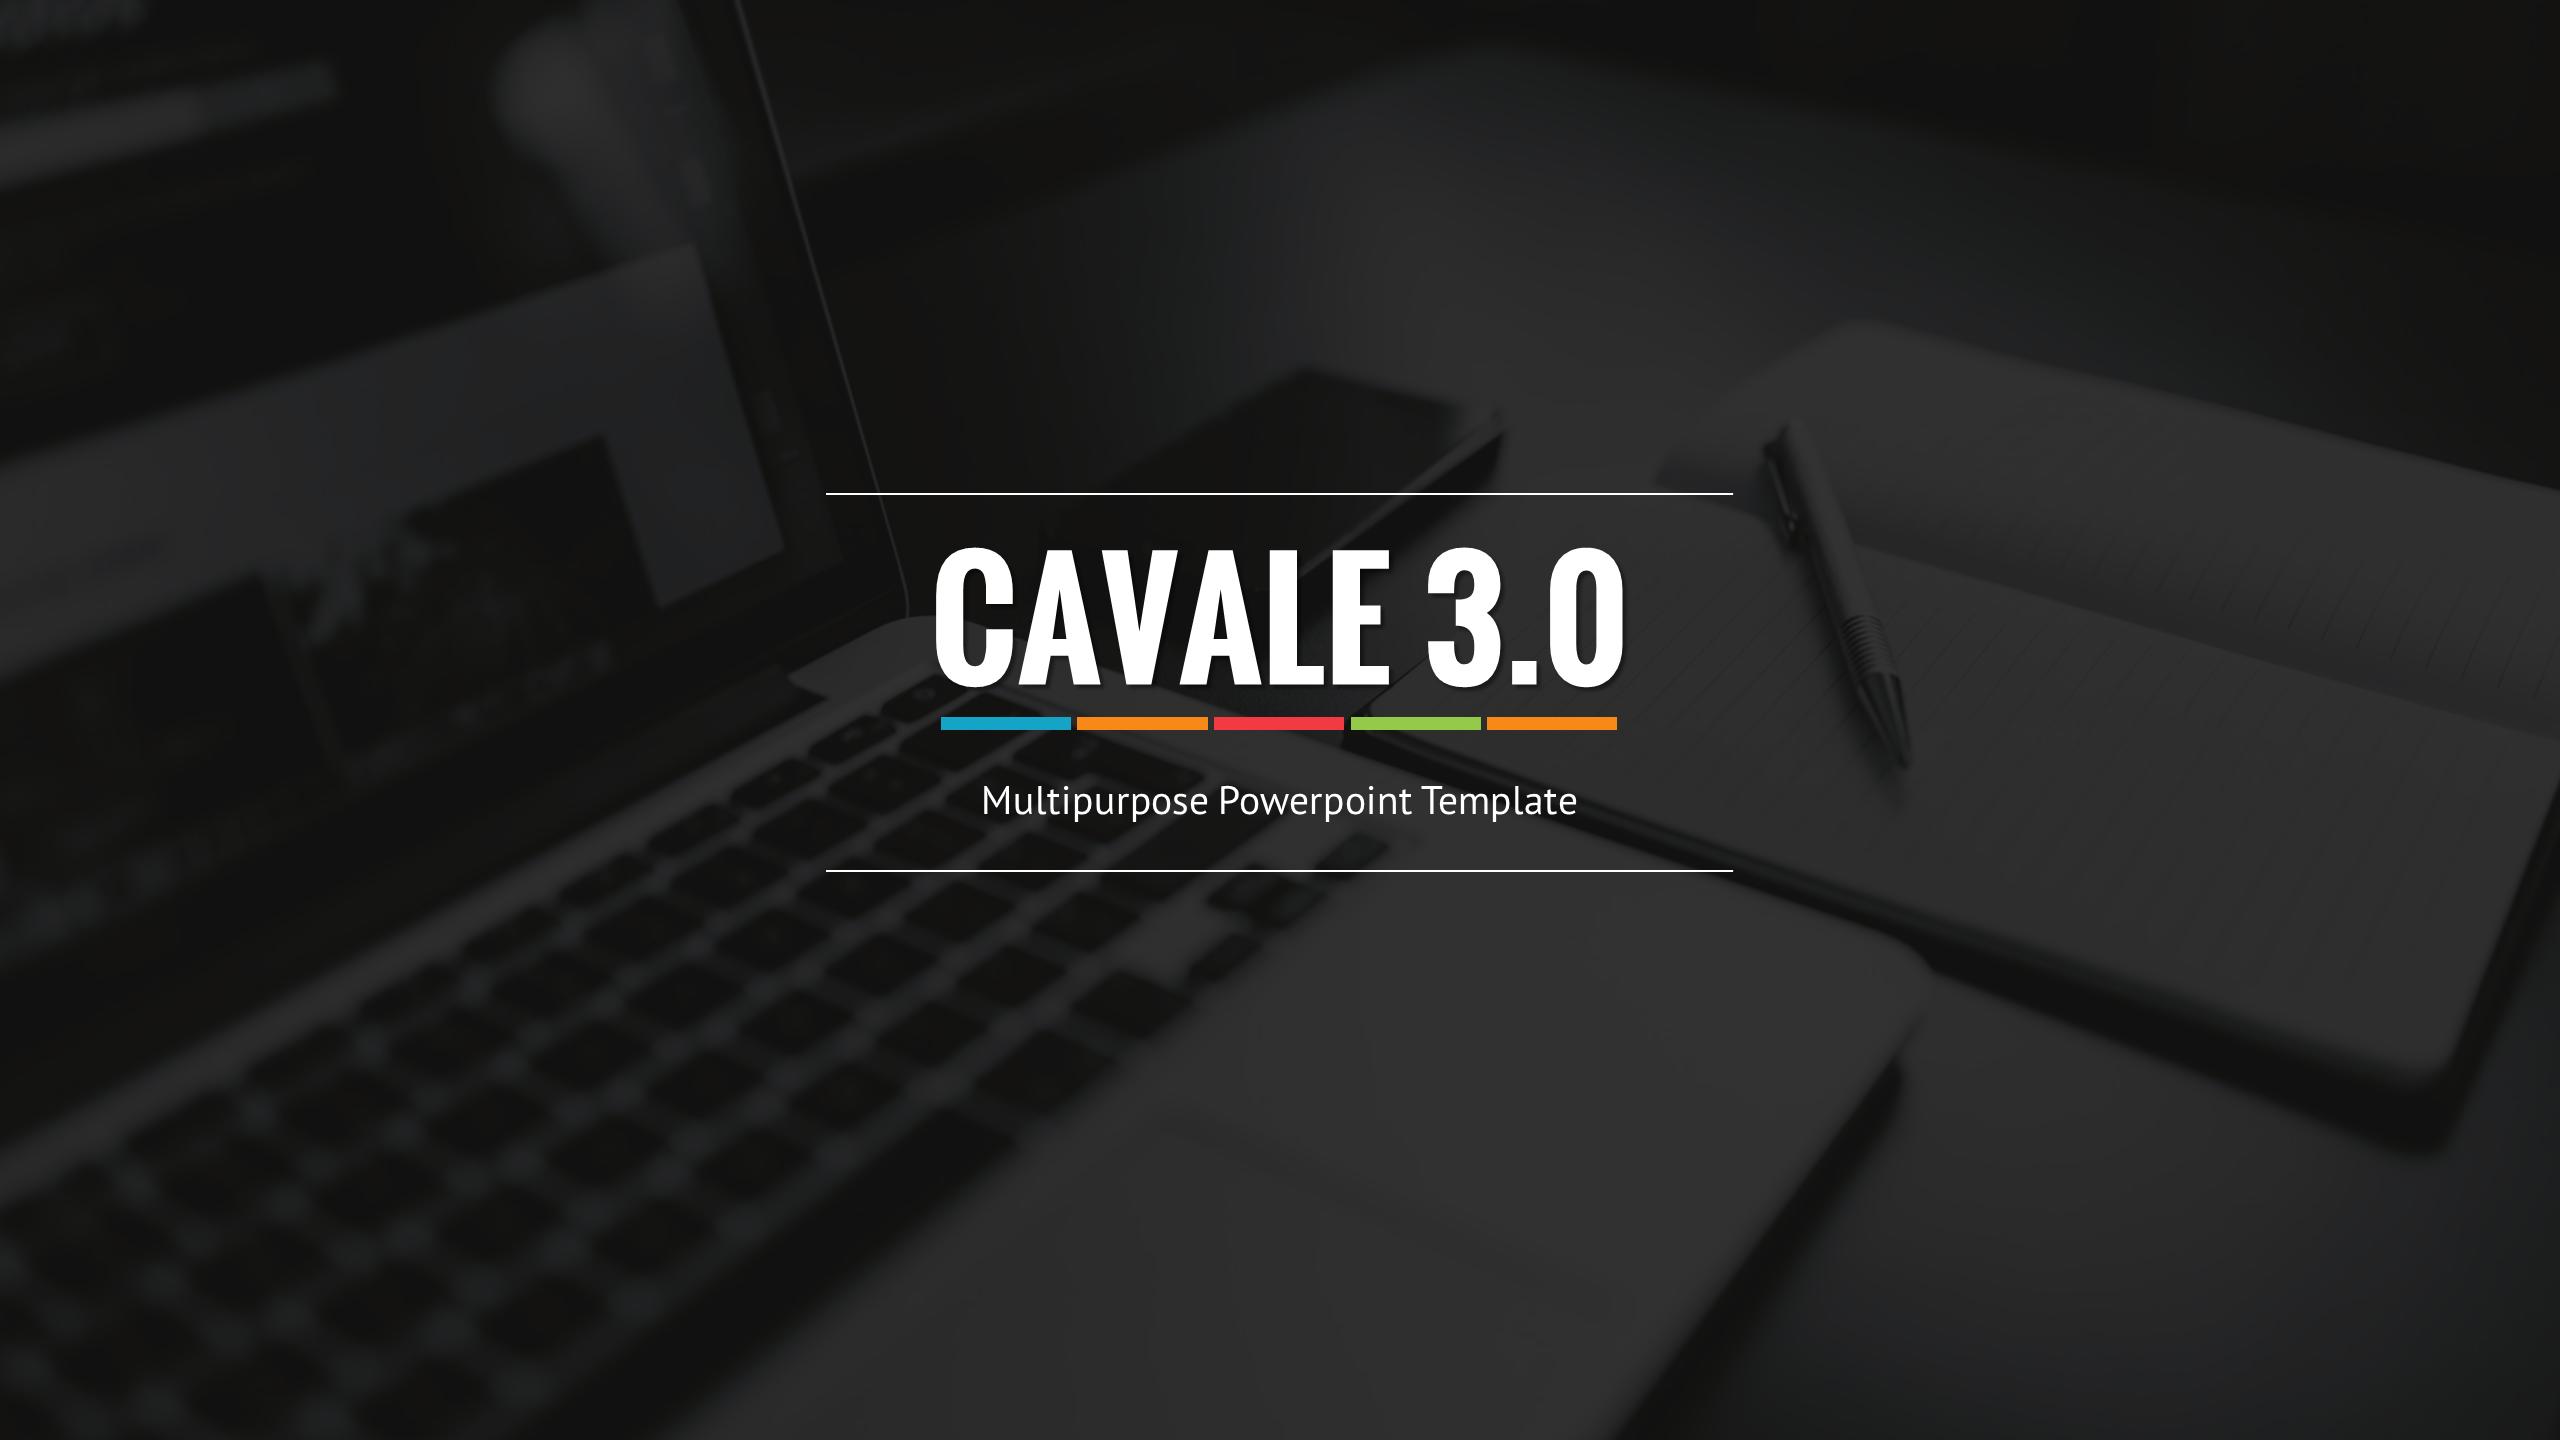 Cavale multipurpose powerpoint presentation template by m duarte business powerpoint templates slide 001 toneelgroepblik Images